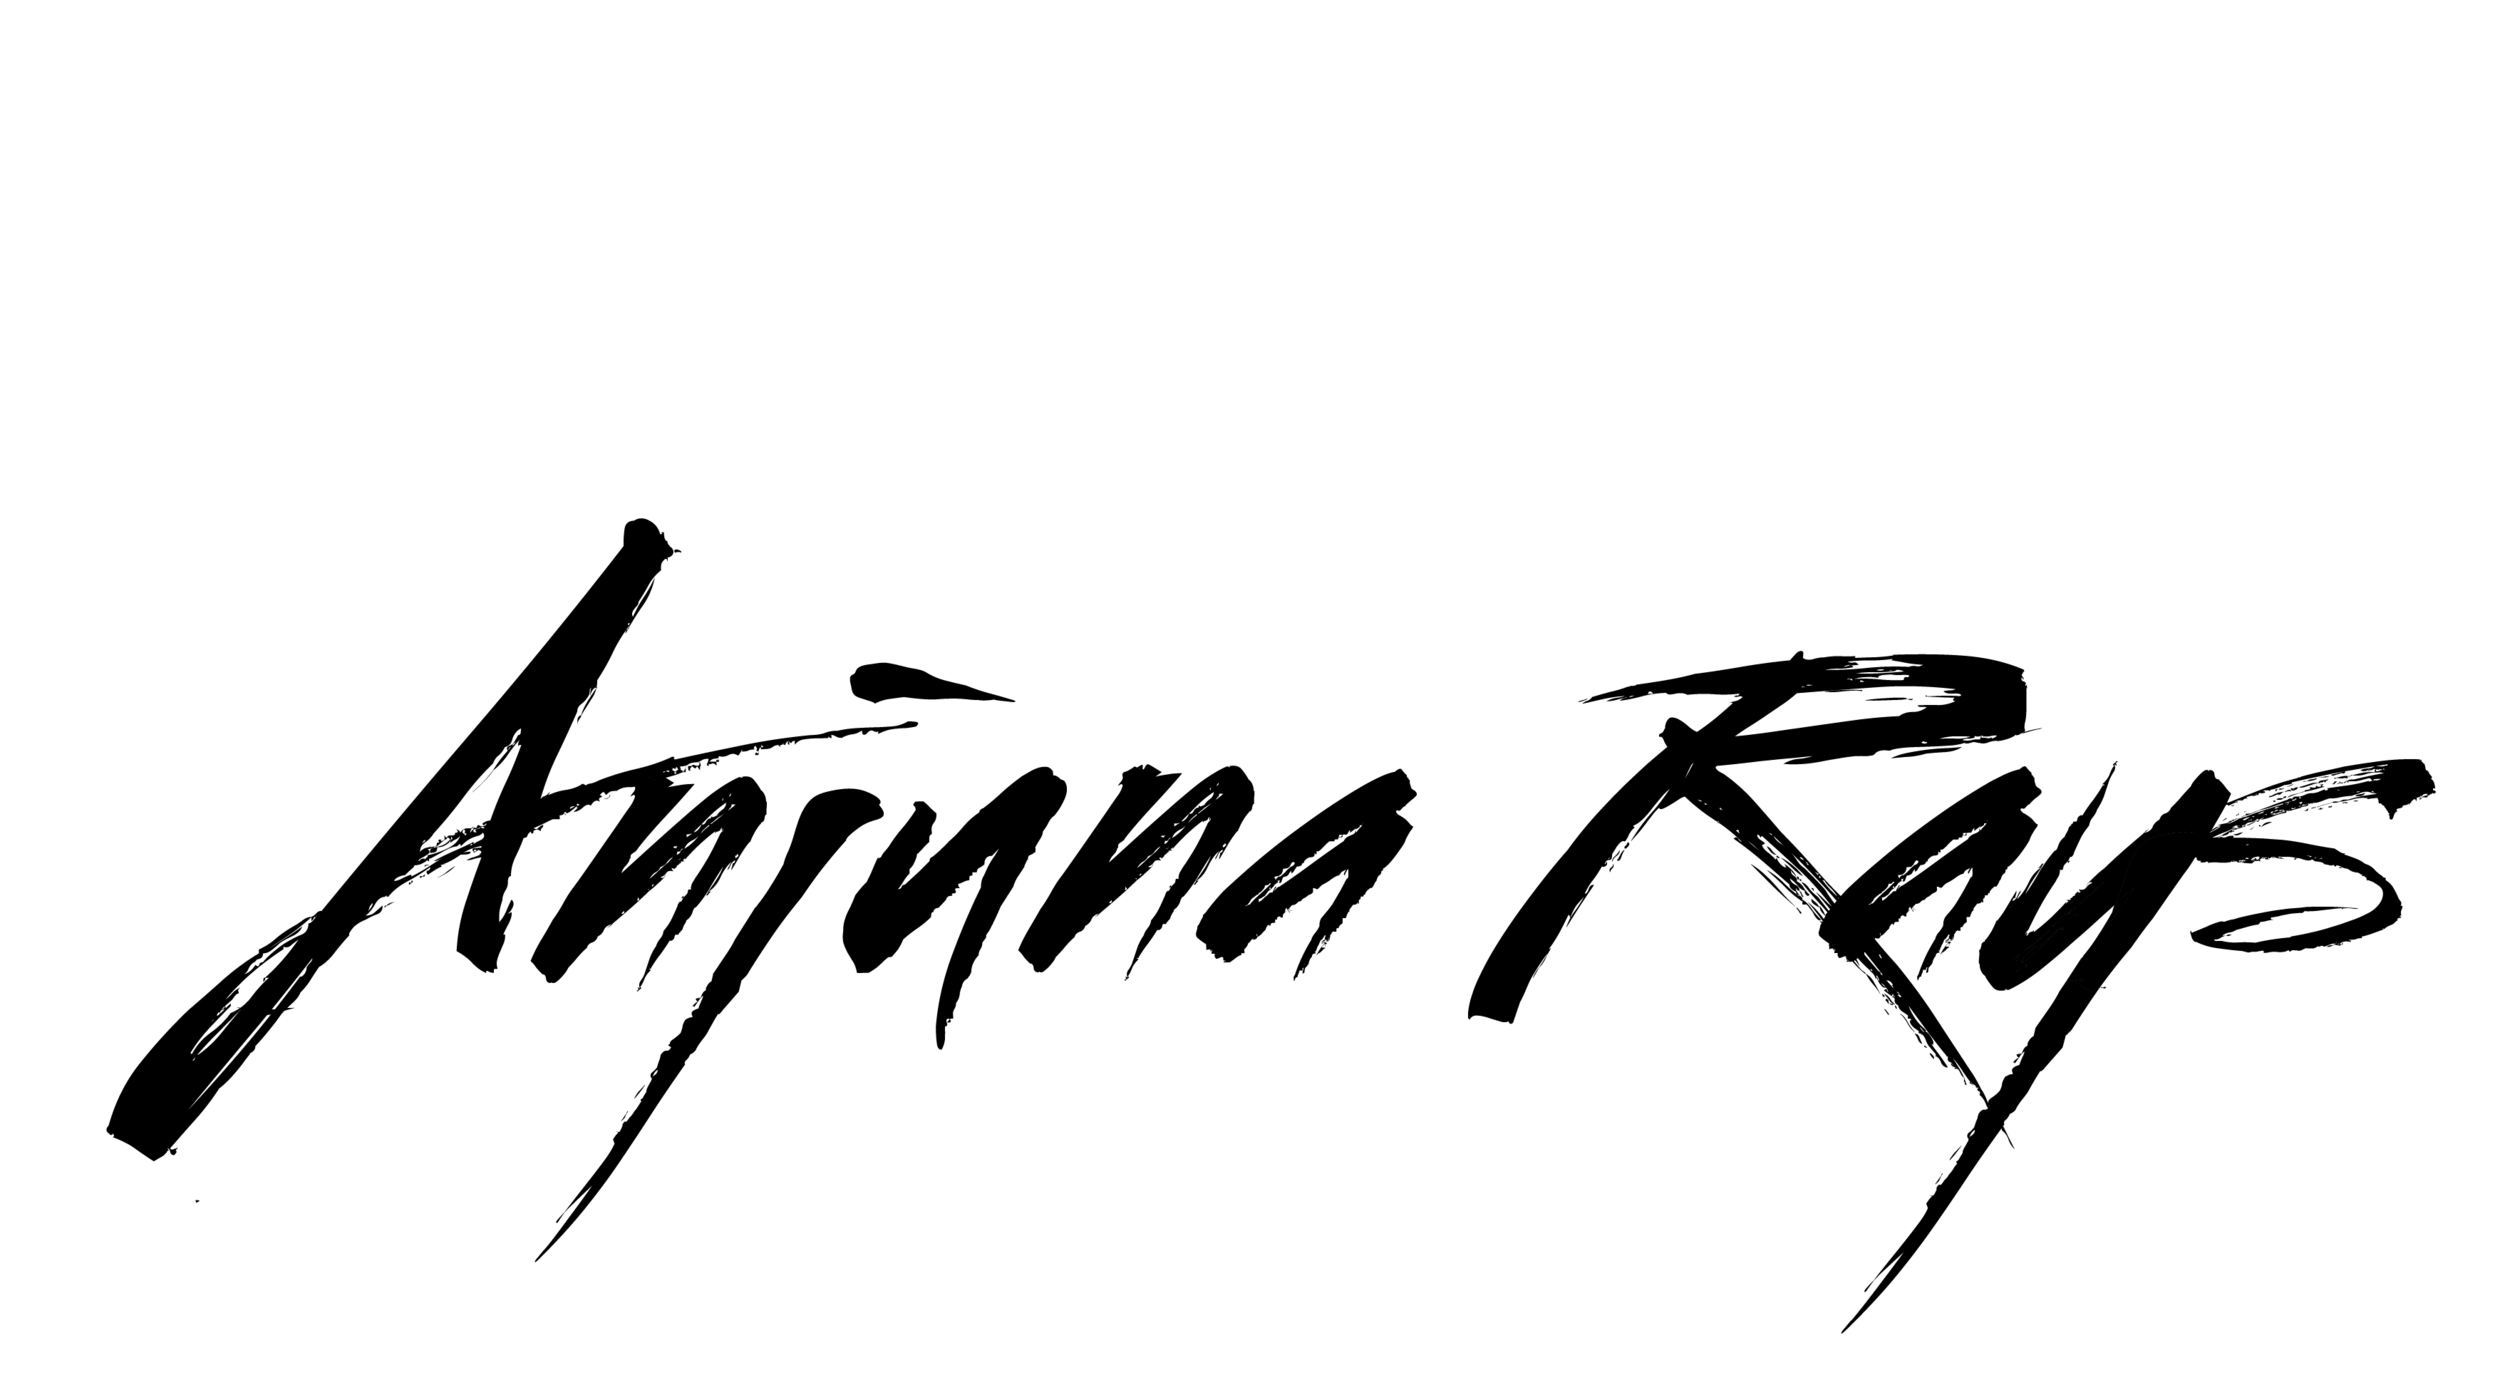 anjuna rays flat logo-01-01 copy.png